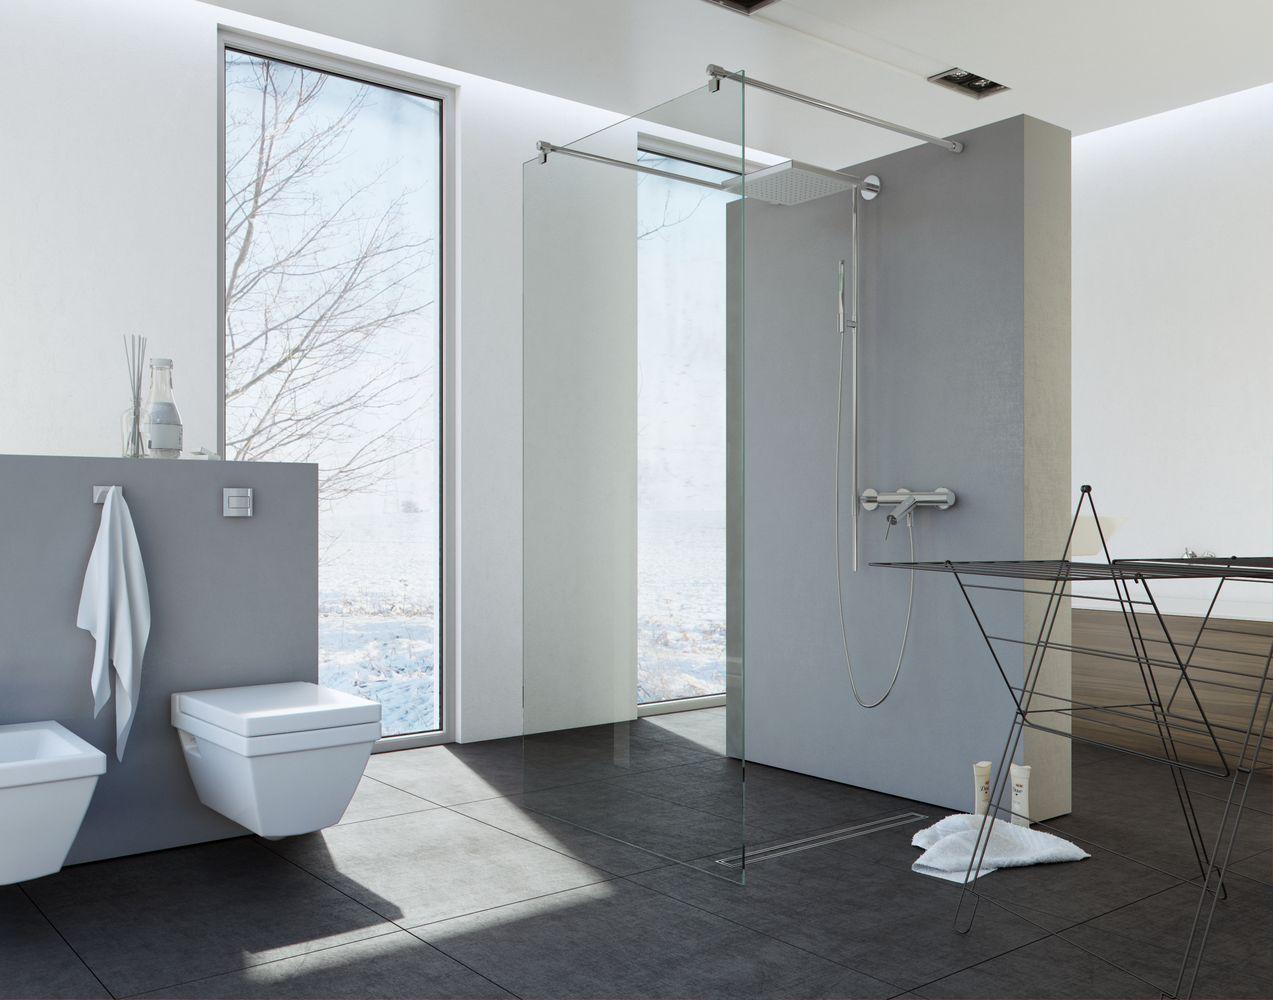 Steny sprcha JEDNODUCHÉ, V 140x200 BK252T14 Boj